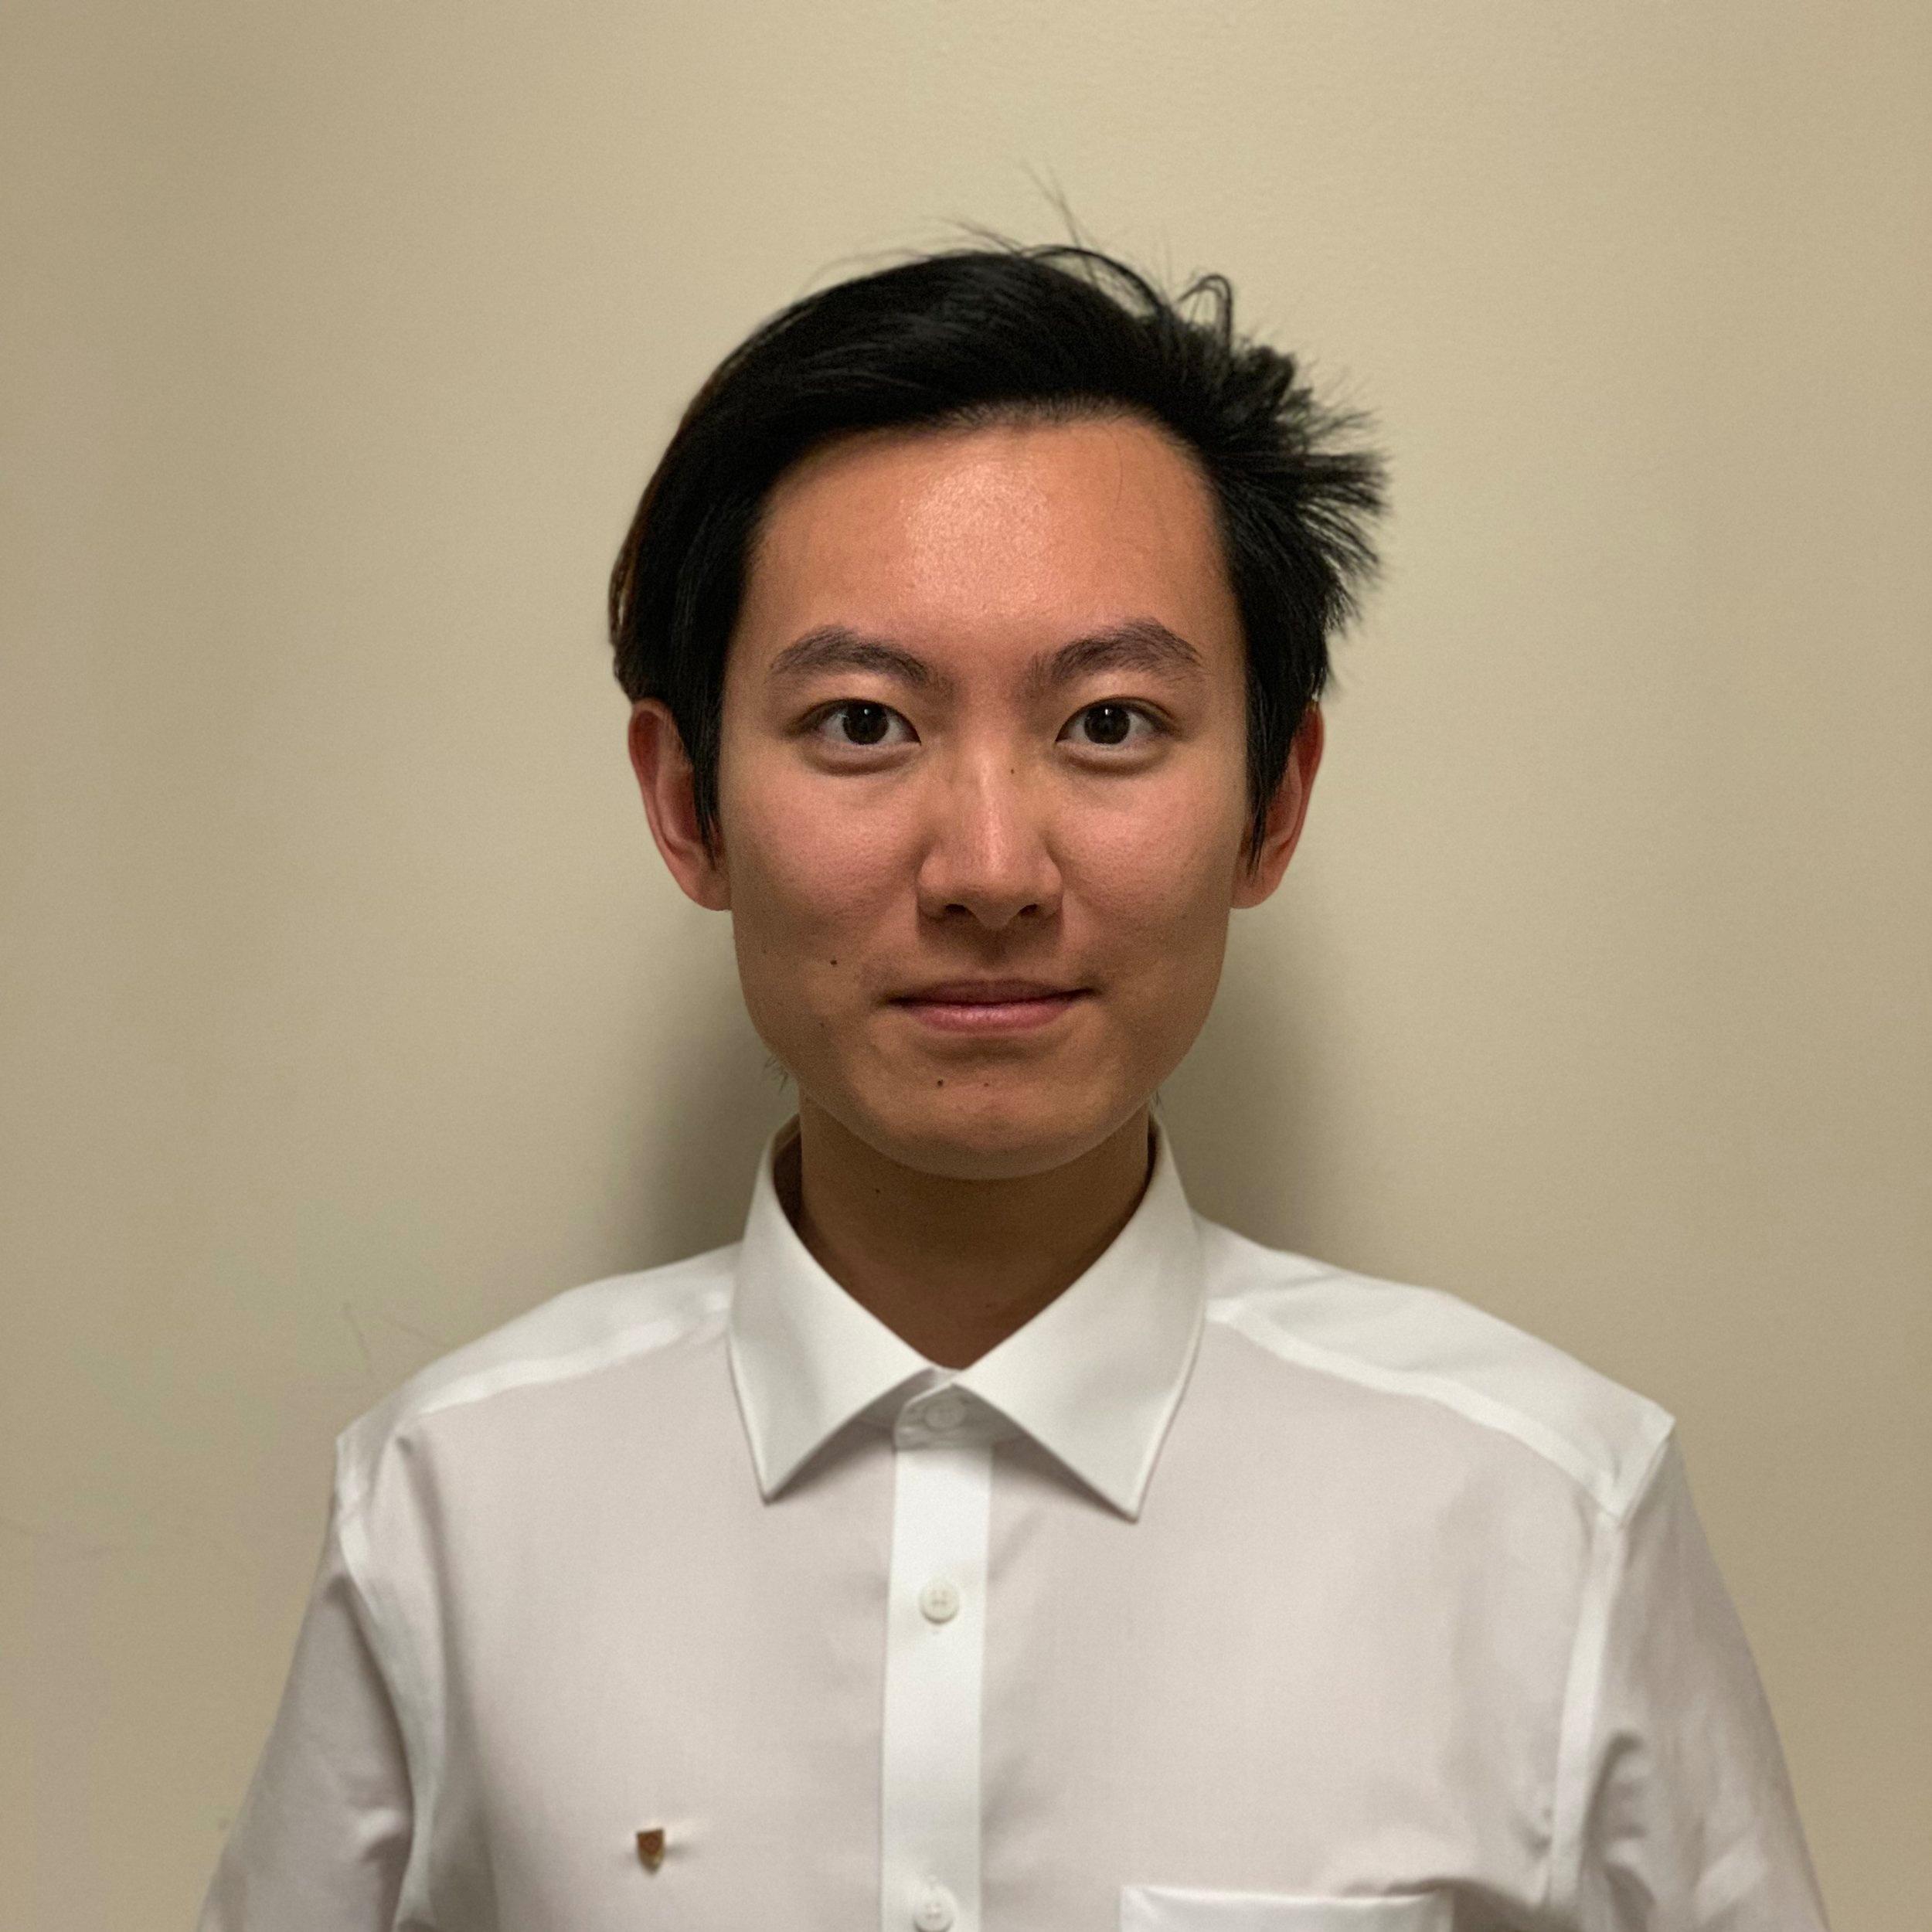 David Du - Junior, Mechanical EngineeringJinan City, Shandong Province, ChinaASMEService Committee